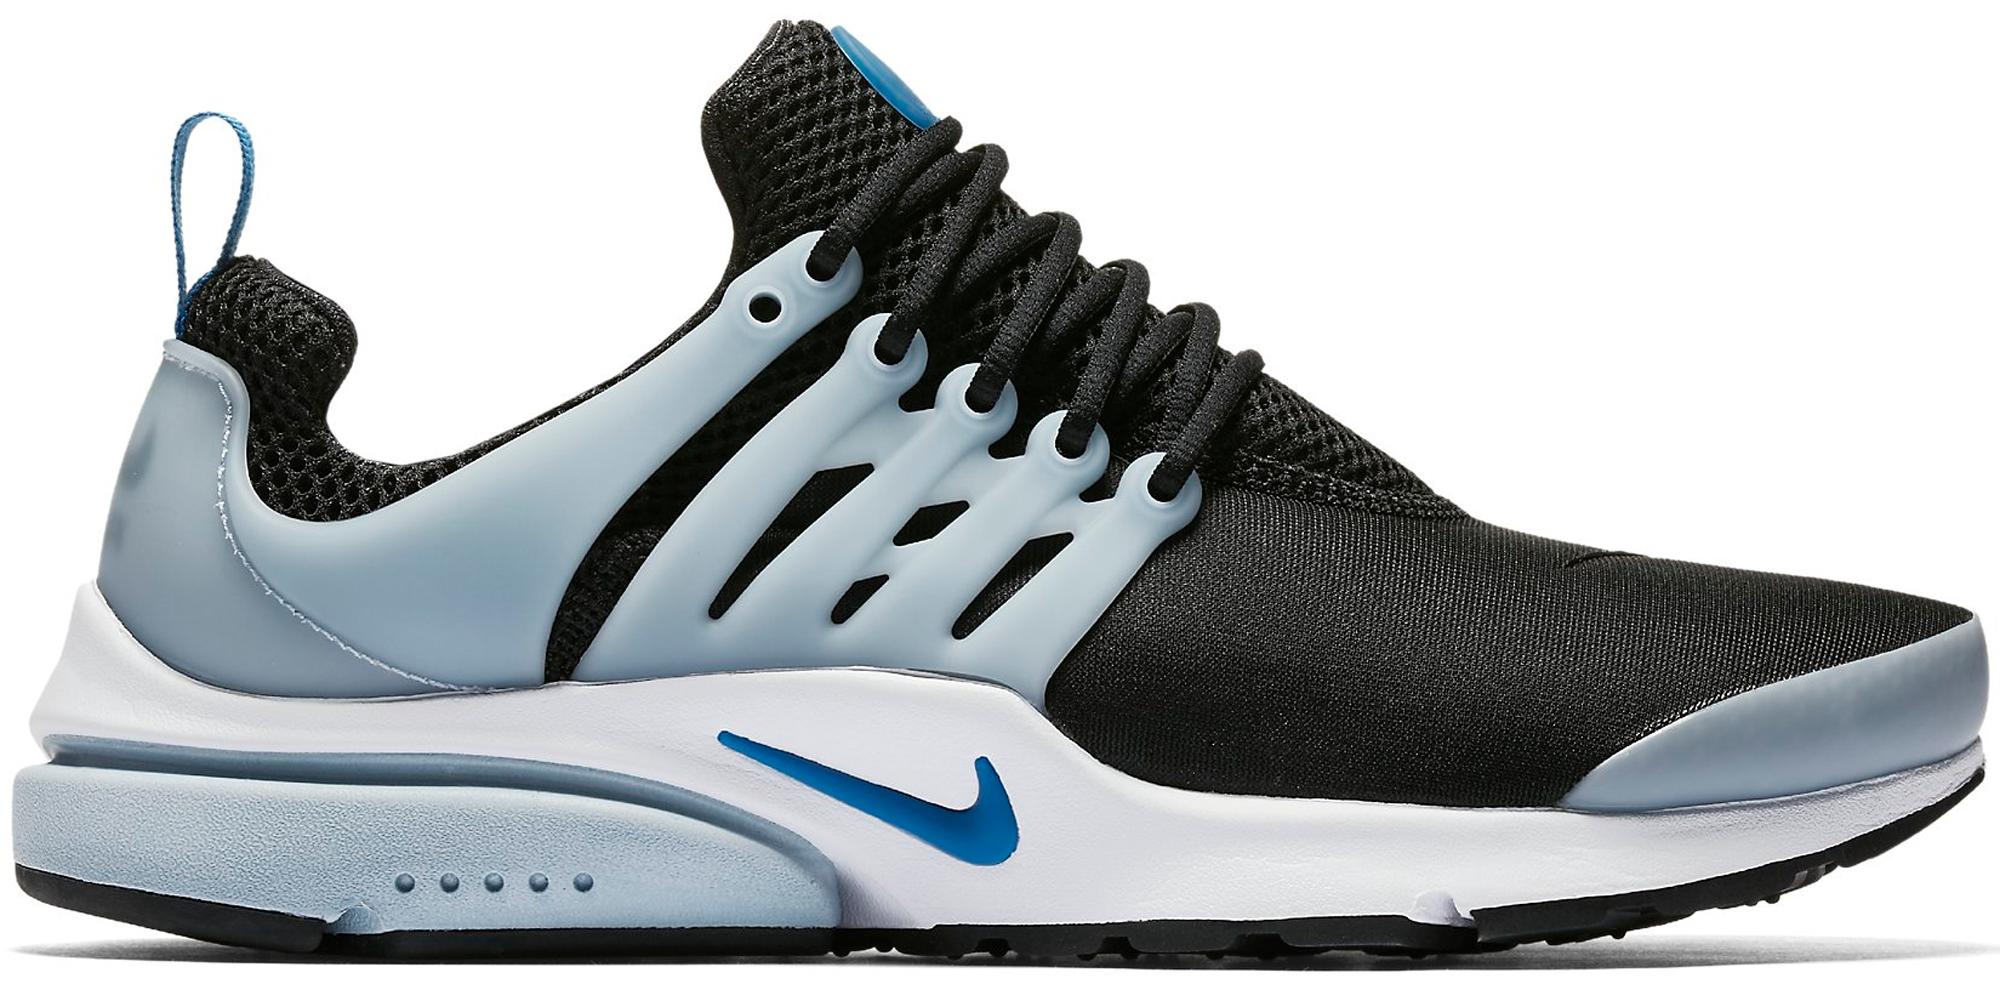 Nike Air Presto Black Blue Jay - 848187-016